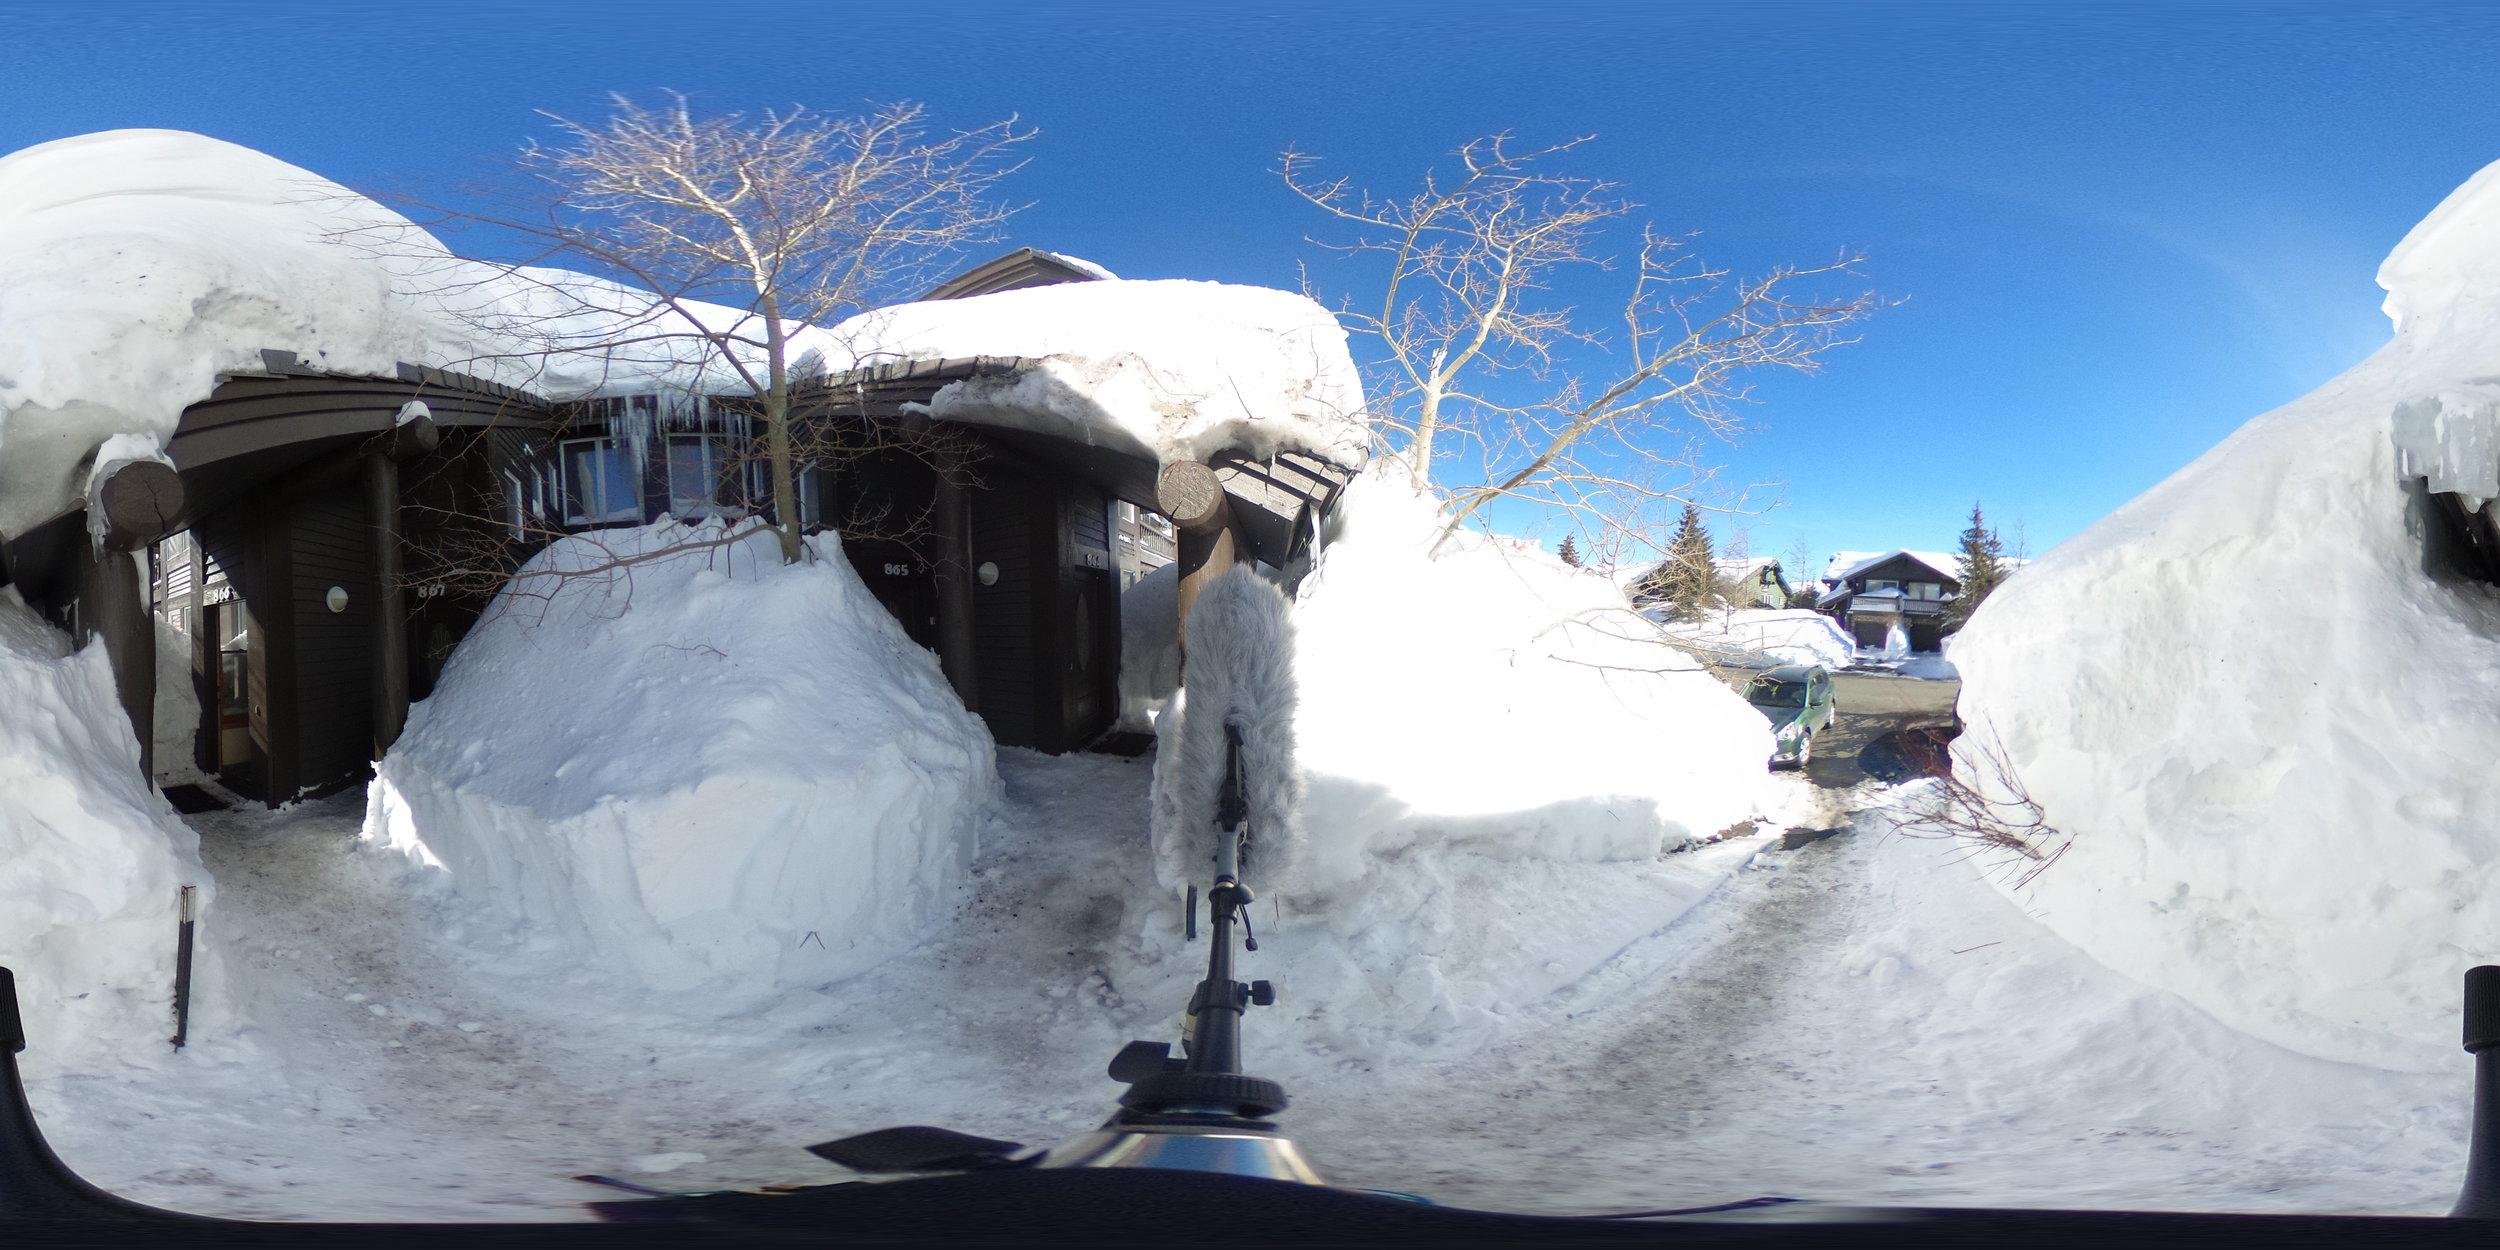 EXT_Day_Snow_IciclesMelting_DistantShoveling_JPEG.JPG